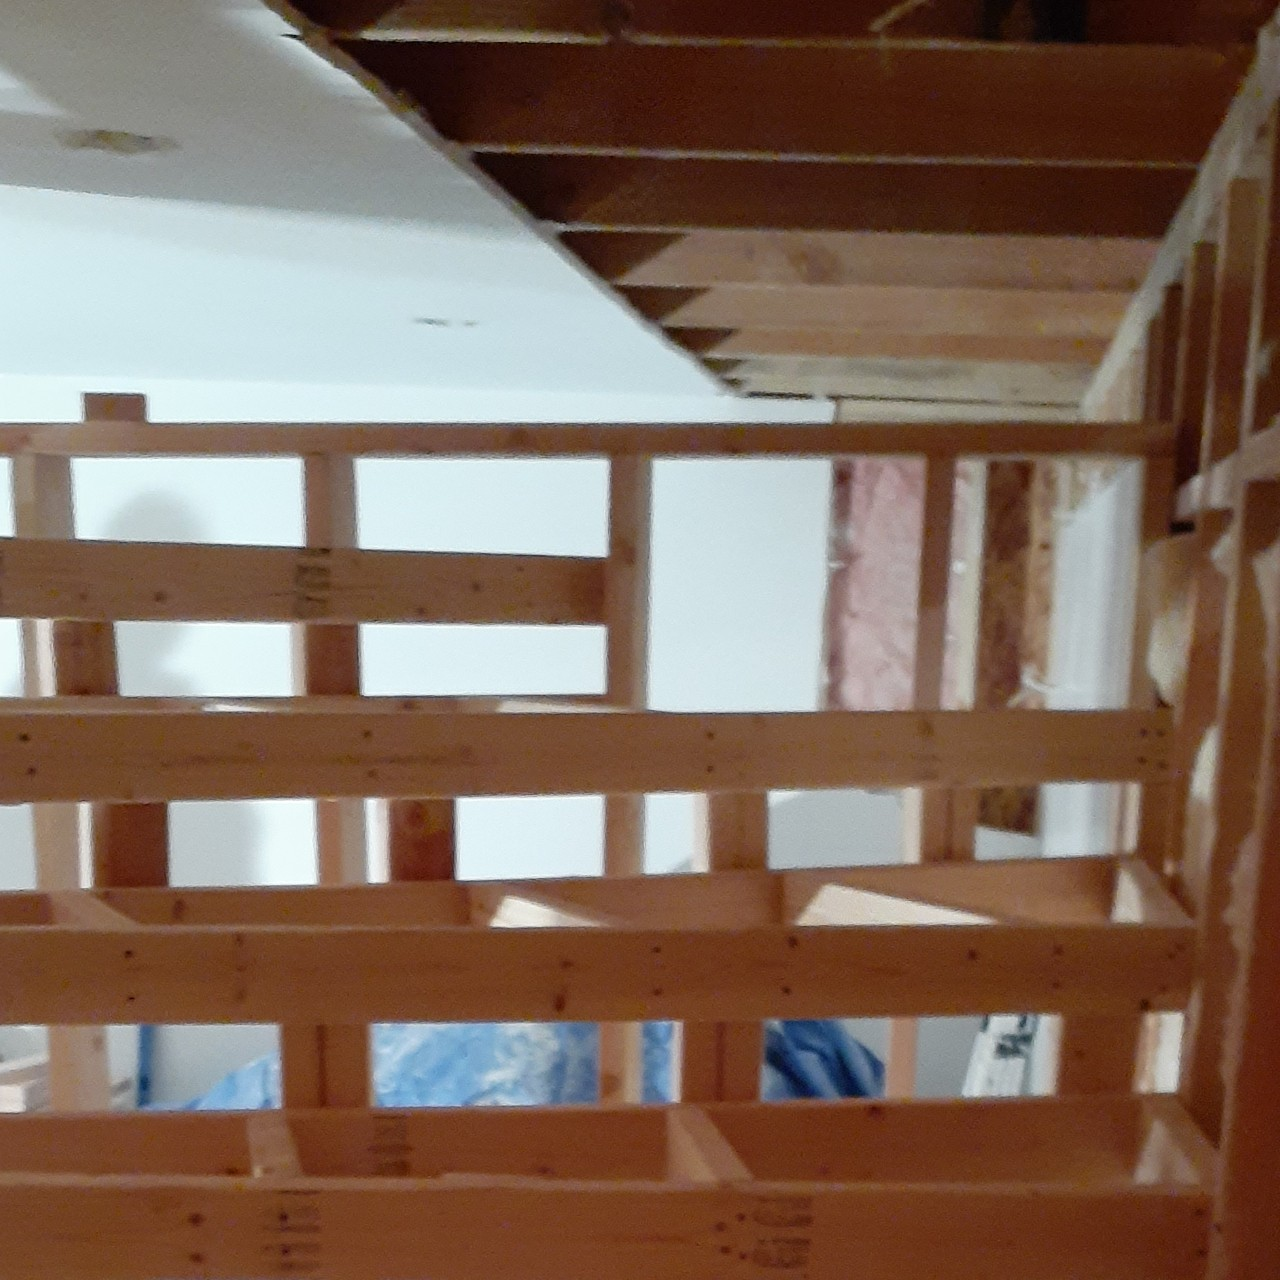 carpentry-wood-framing-second-floor-home-addition--framing-27